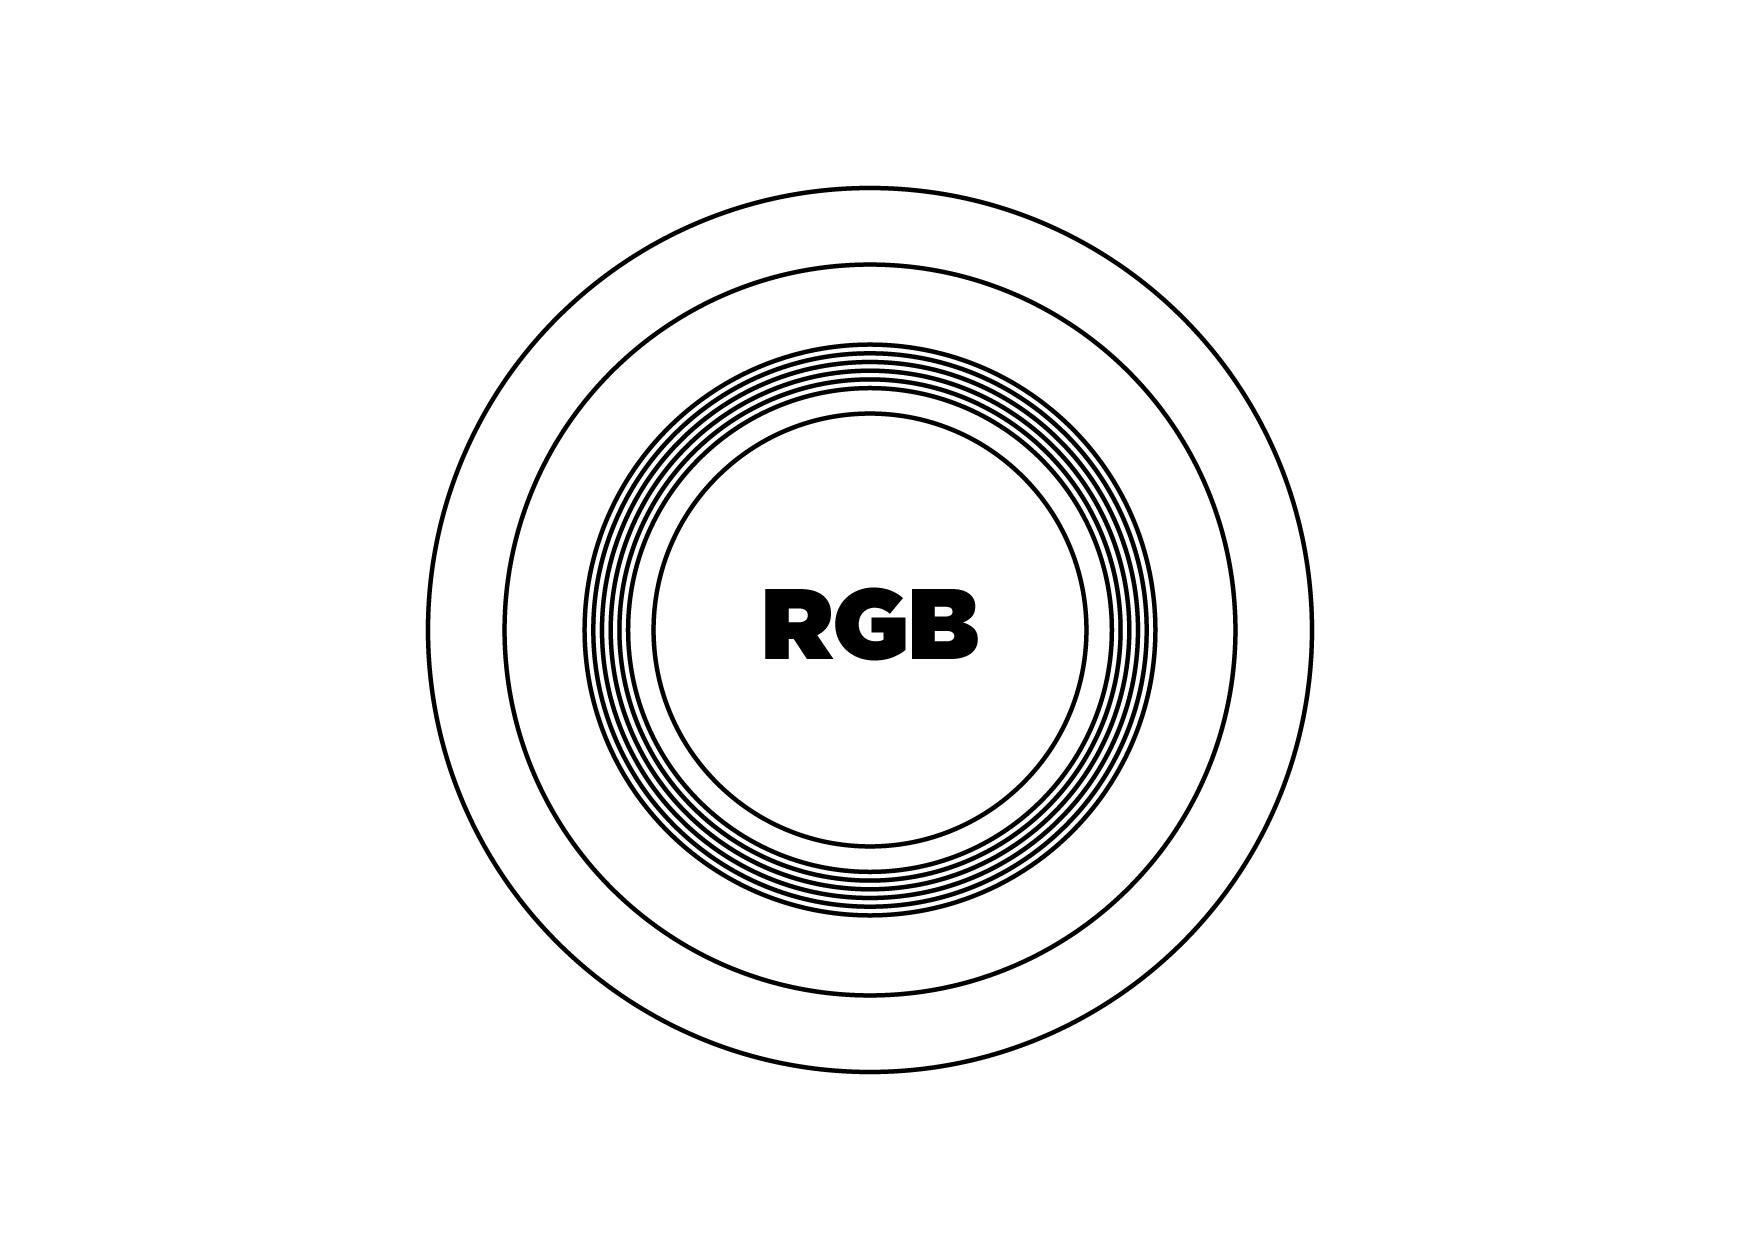 RGB_Thumbnail.jpg